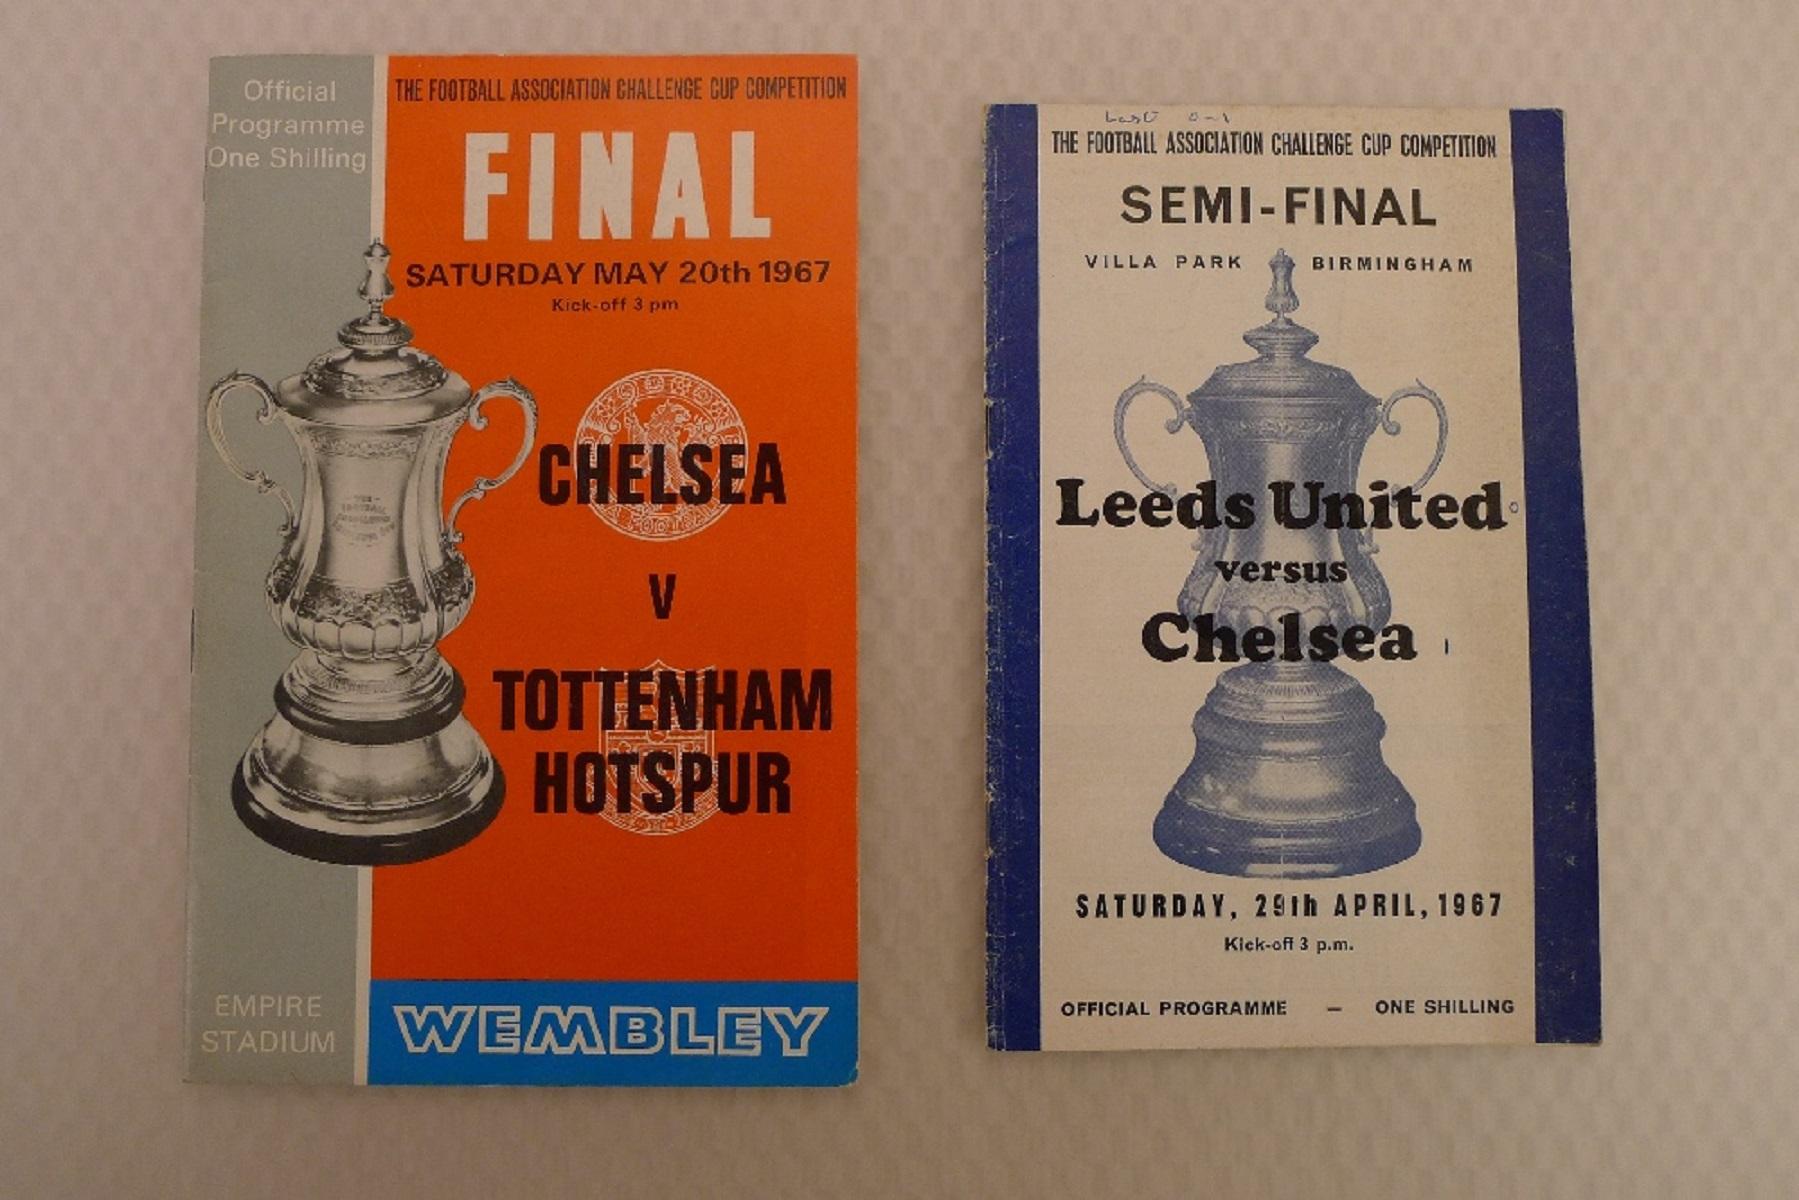 FA Cup football programmes 1967 1 x Final and 1 x Semi Final football programmes comprising Final